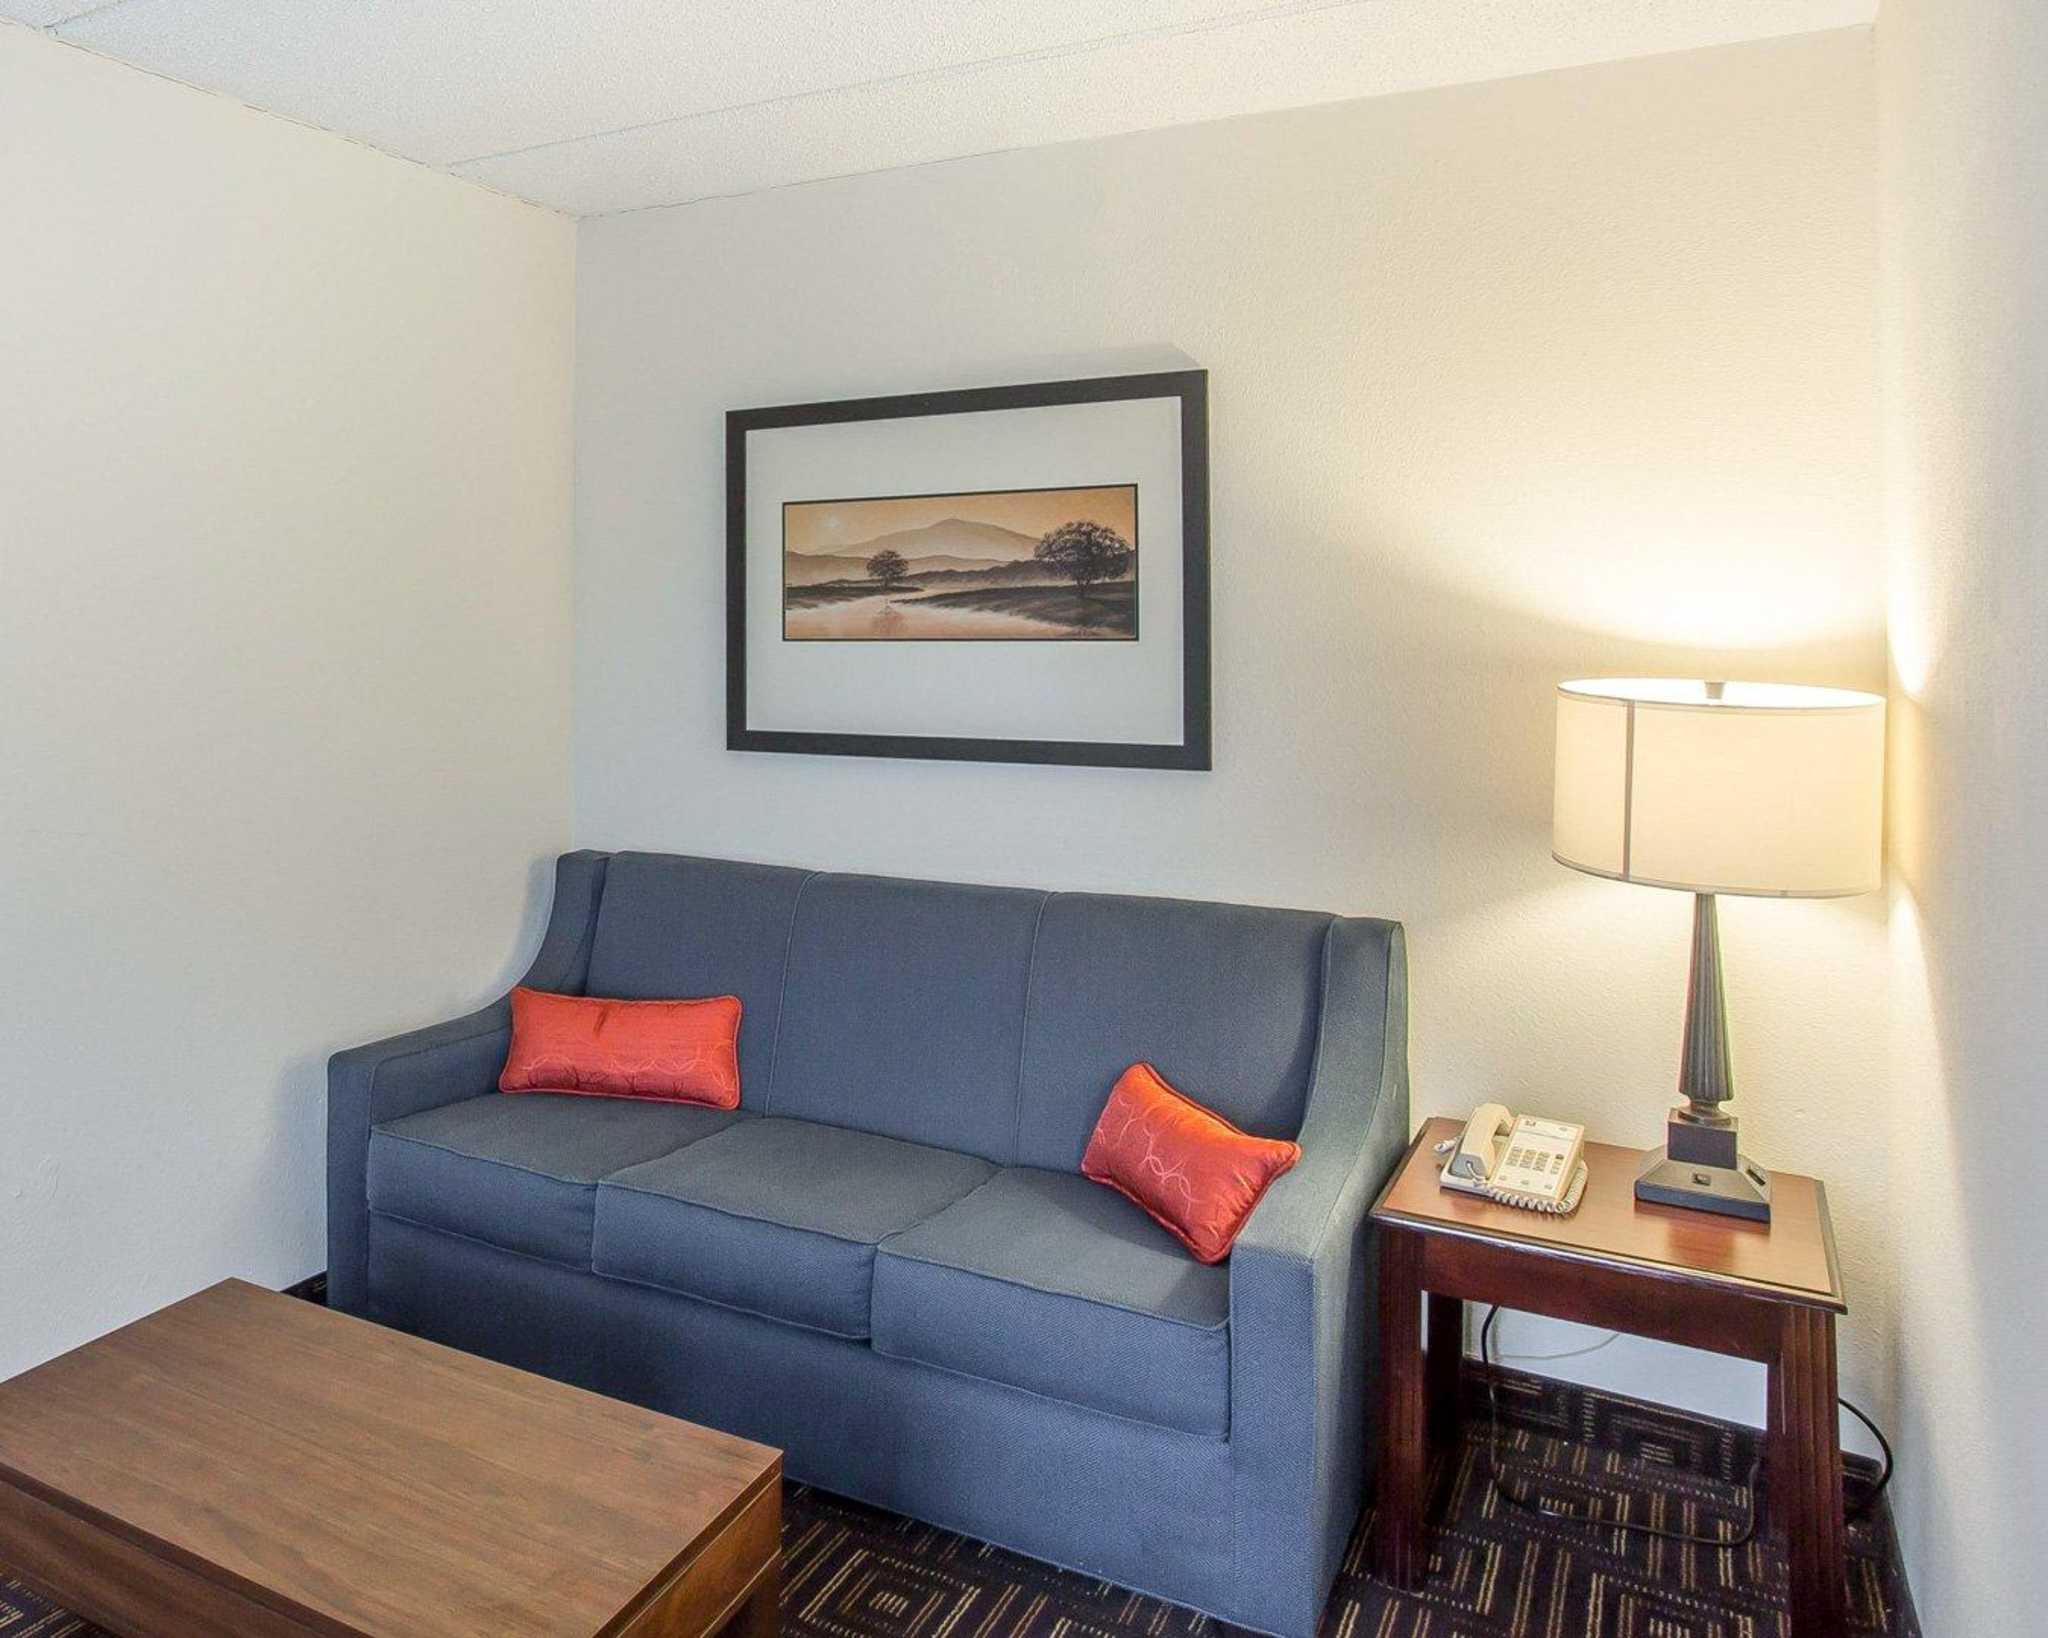 Yje Best Room Rates